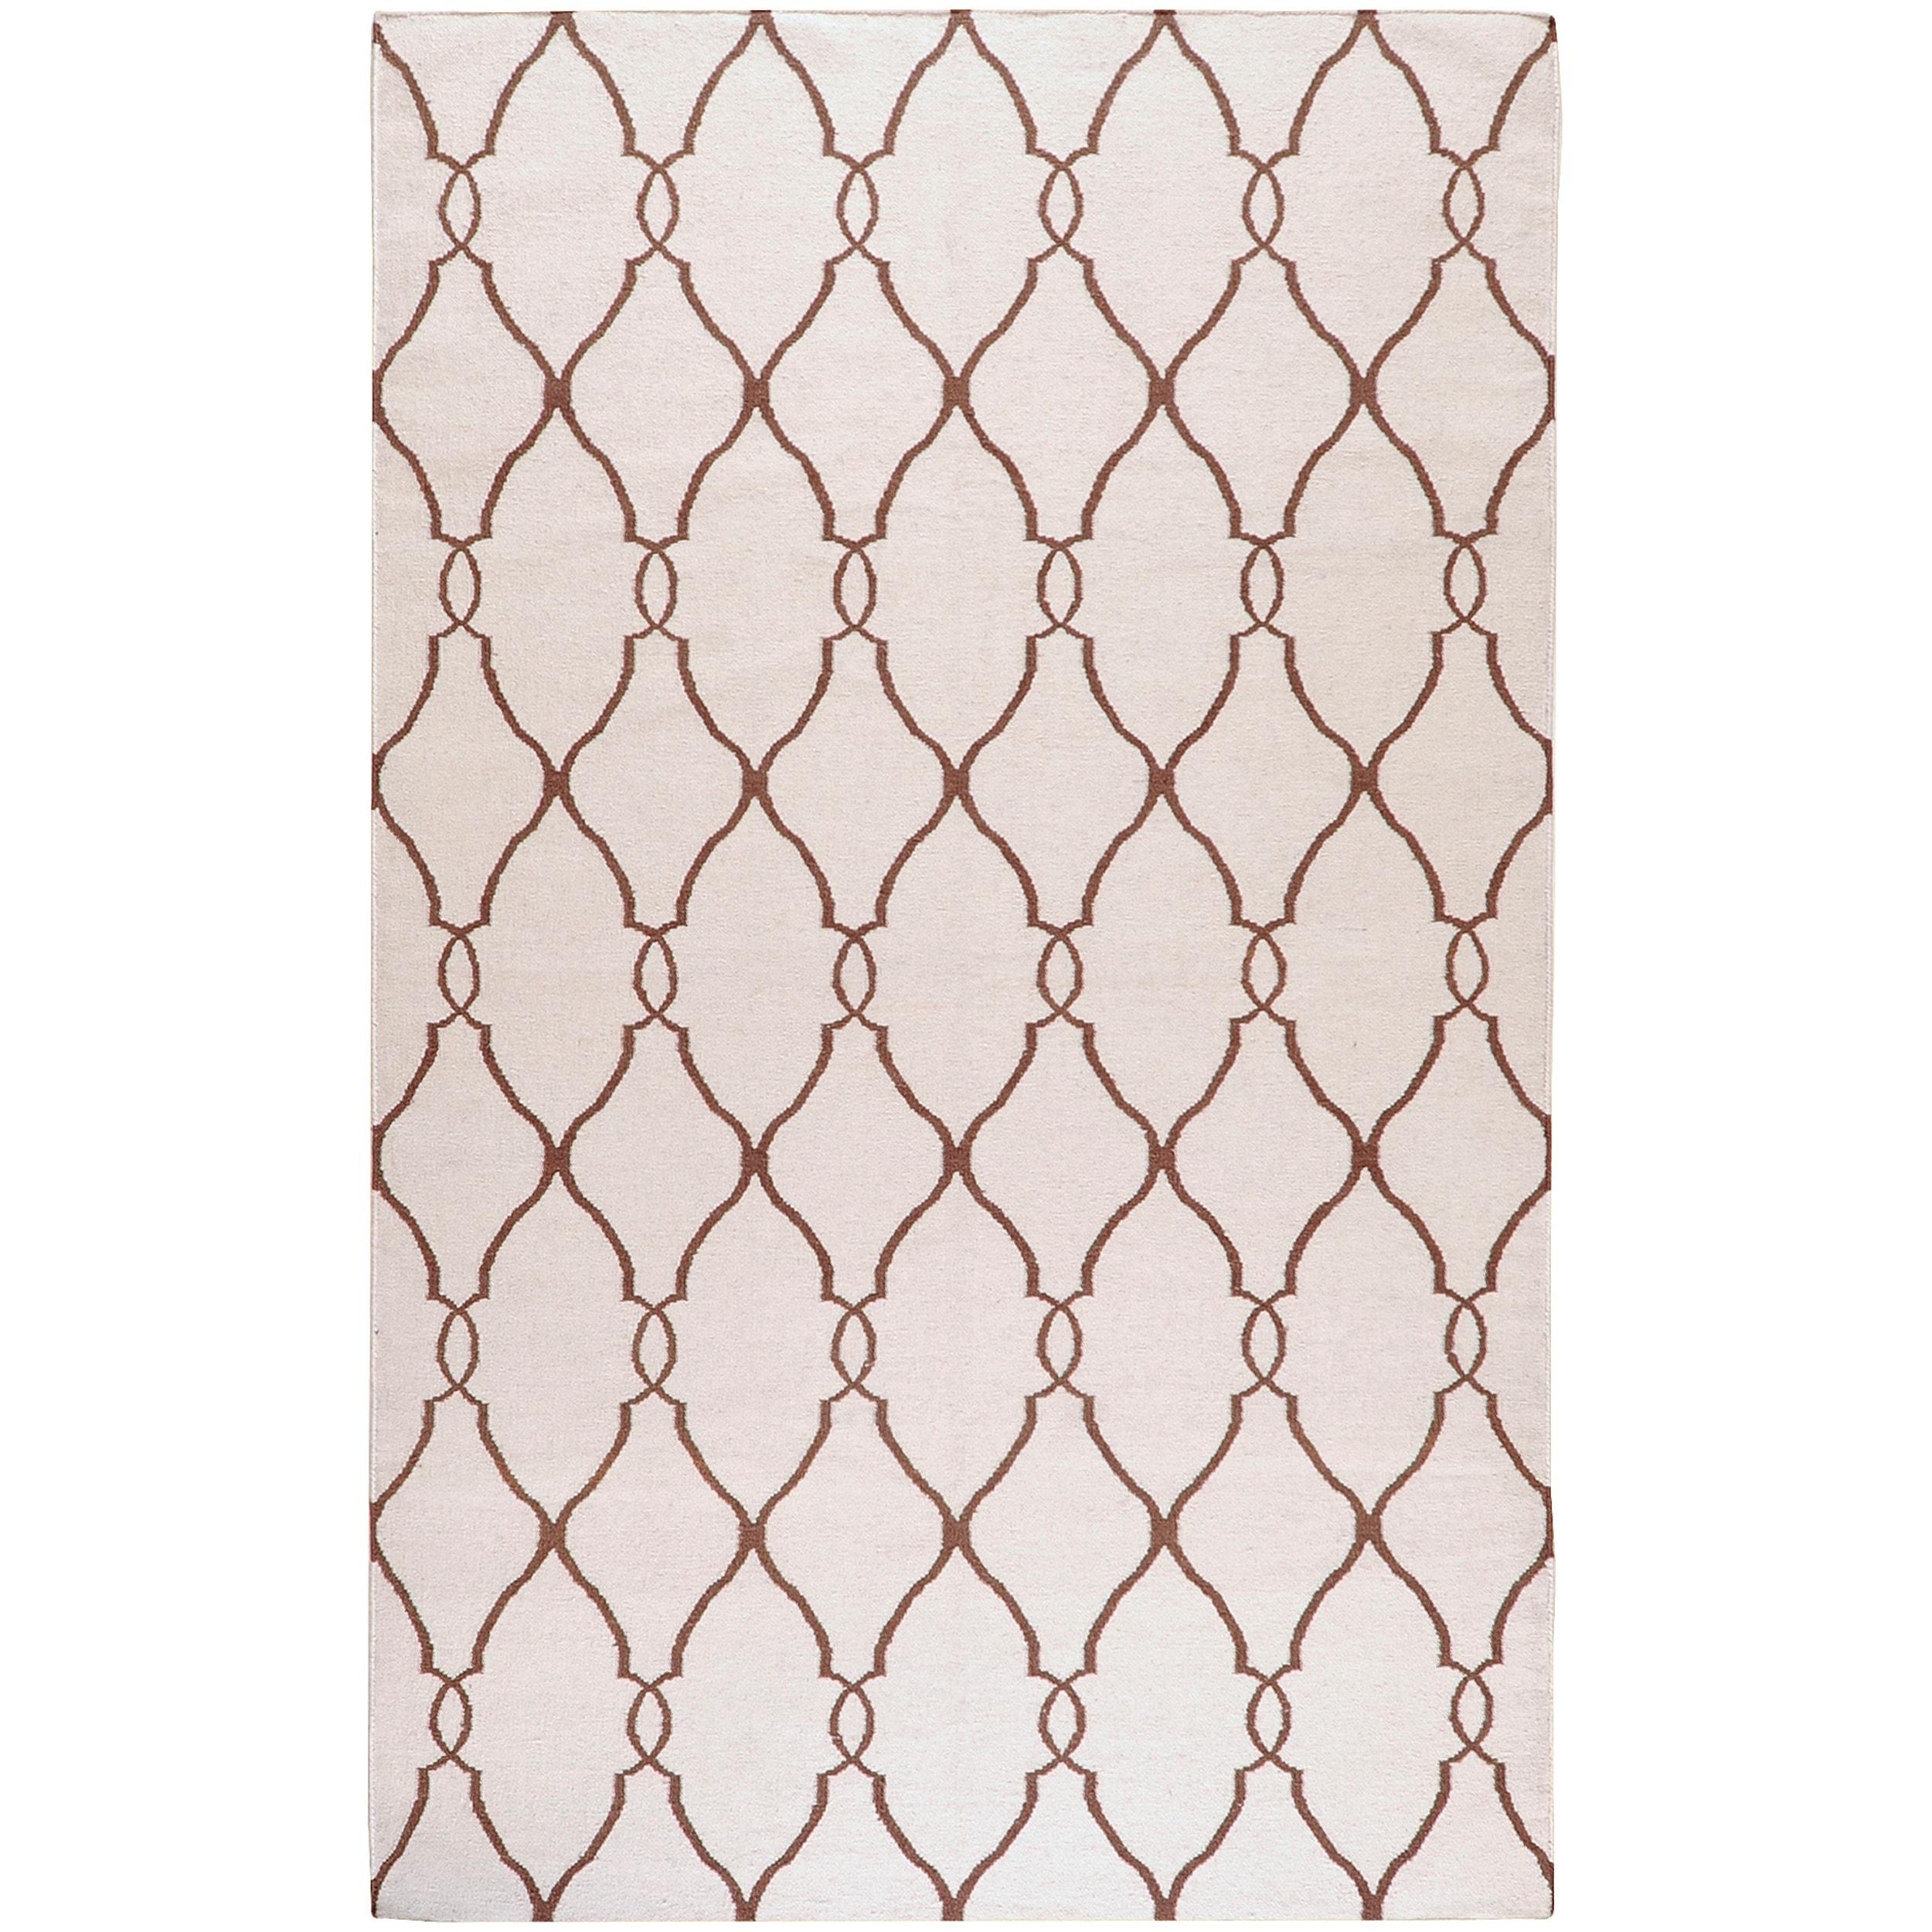 Jill Rosenwald Hand-woven Colossus Ivory Flatweave Wool Rug (3'6 x 5'6)